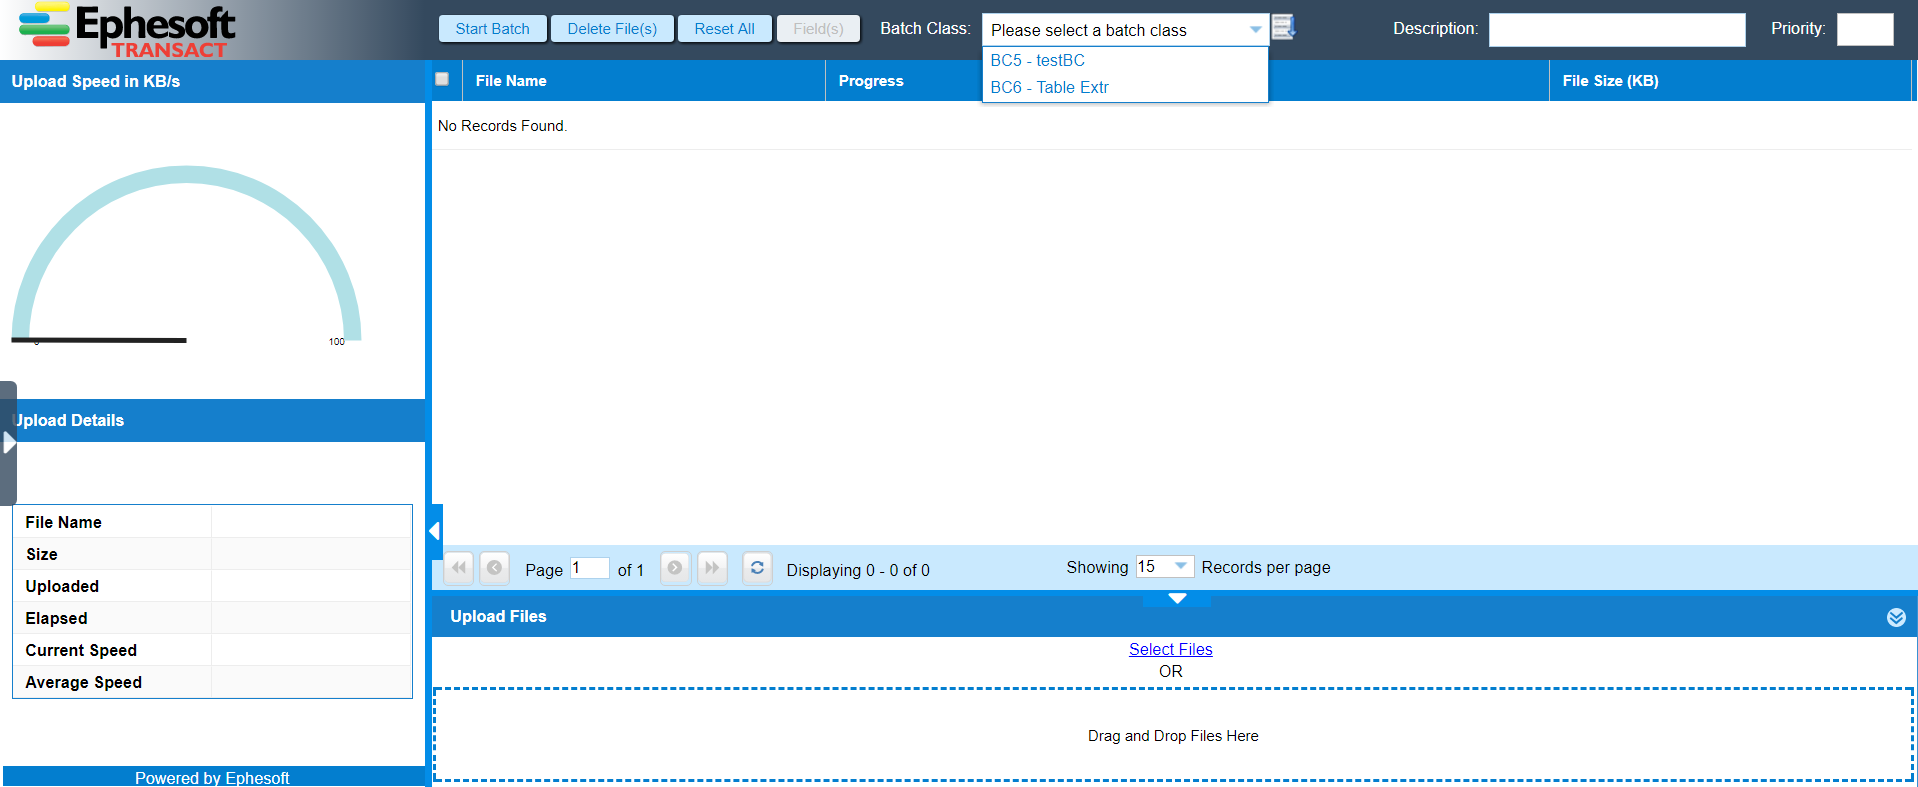 C:\Users\Ephesoft\AppData\Local\Microsoft\Windows\INetCache\Content.Word\user1,2.png